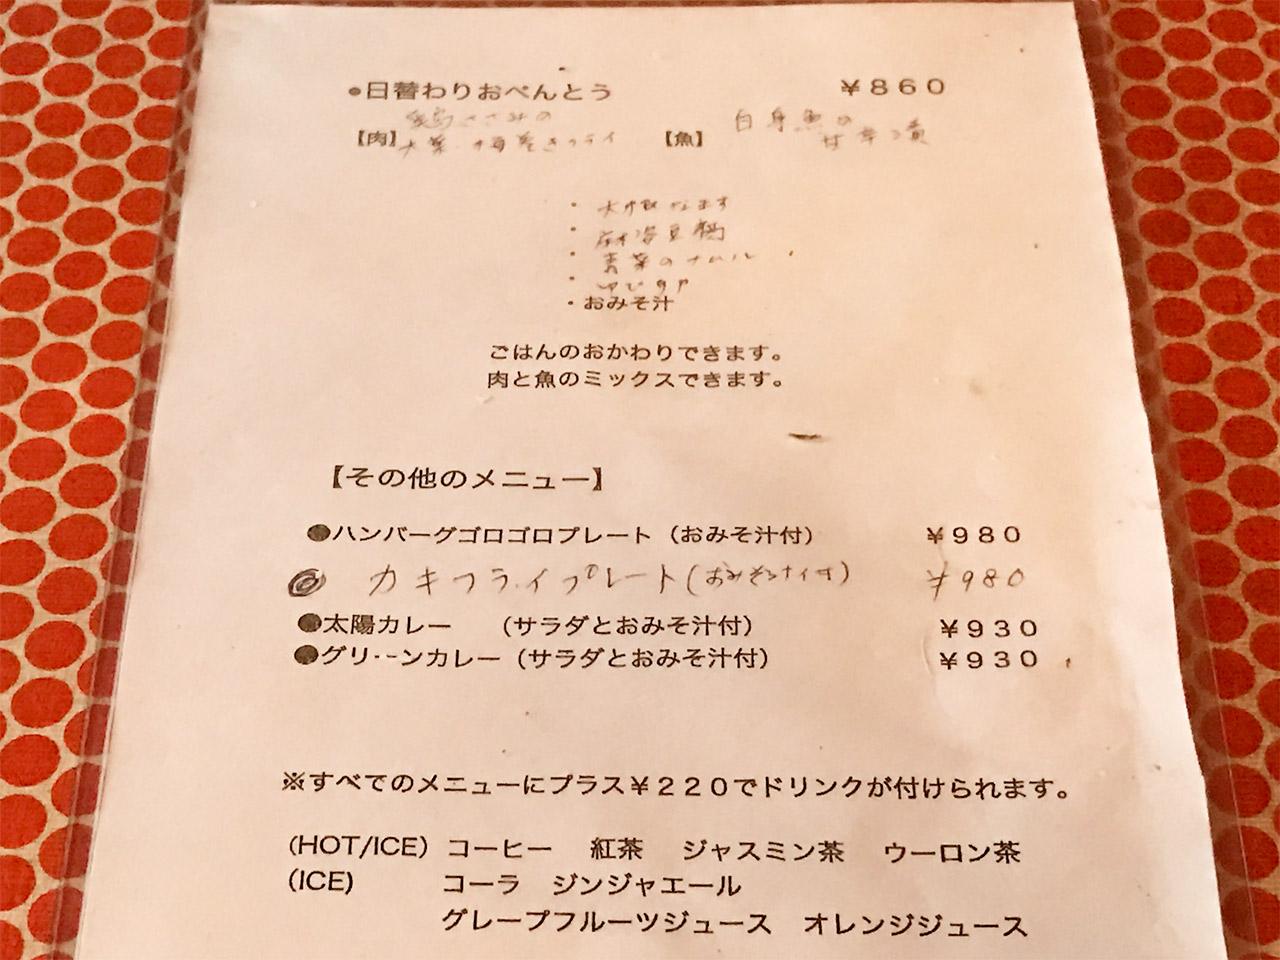 ikejiri-taiyou-menu